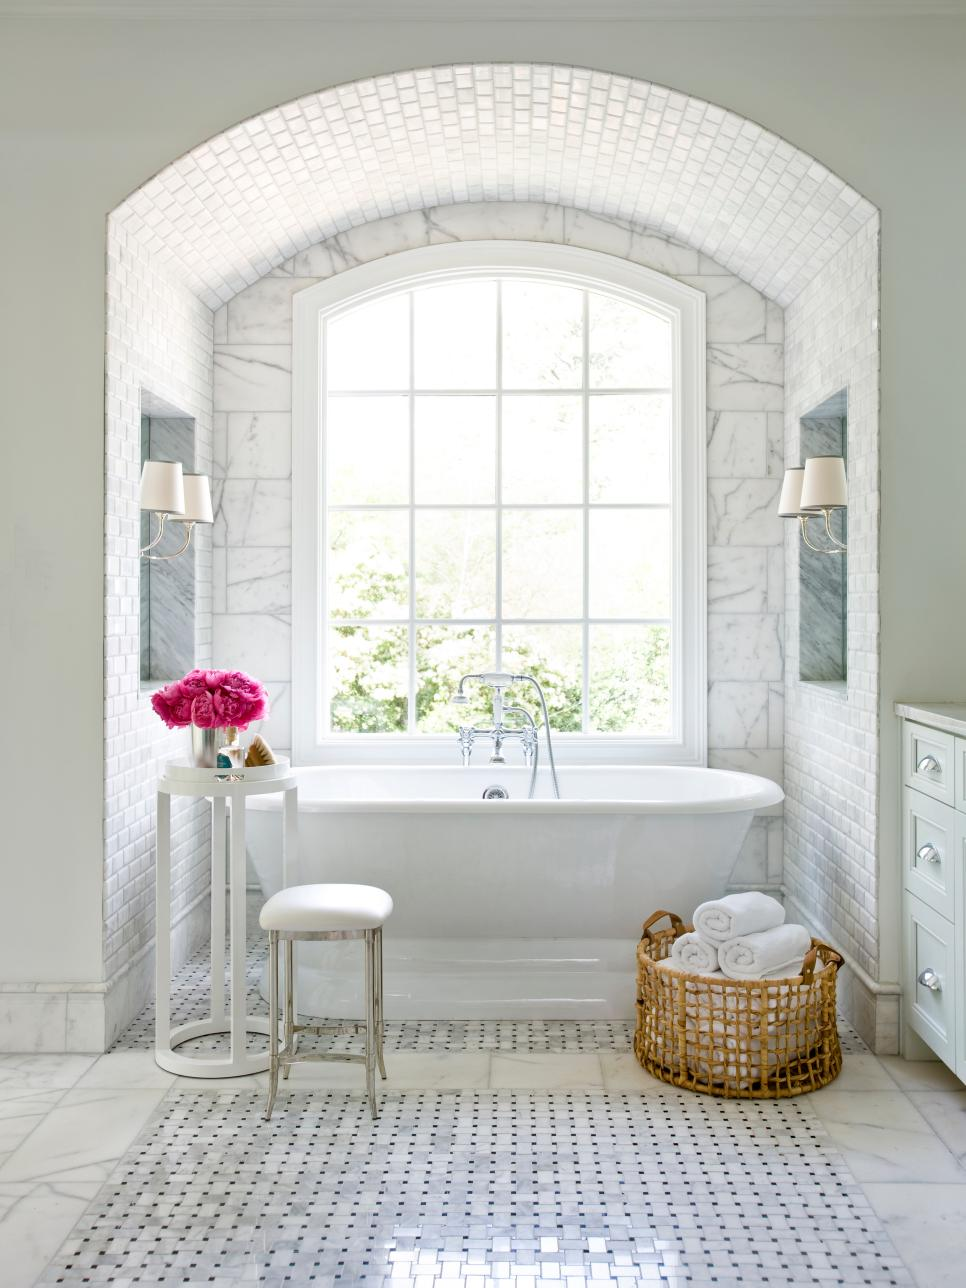 Simply Chic Bathroom Tile Beauteous Wall Tiles For Bathroom Designs